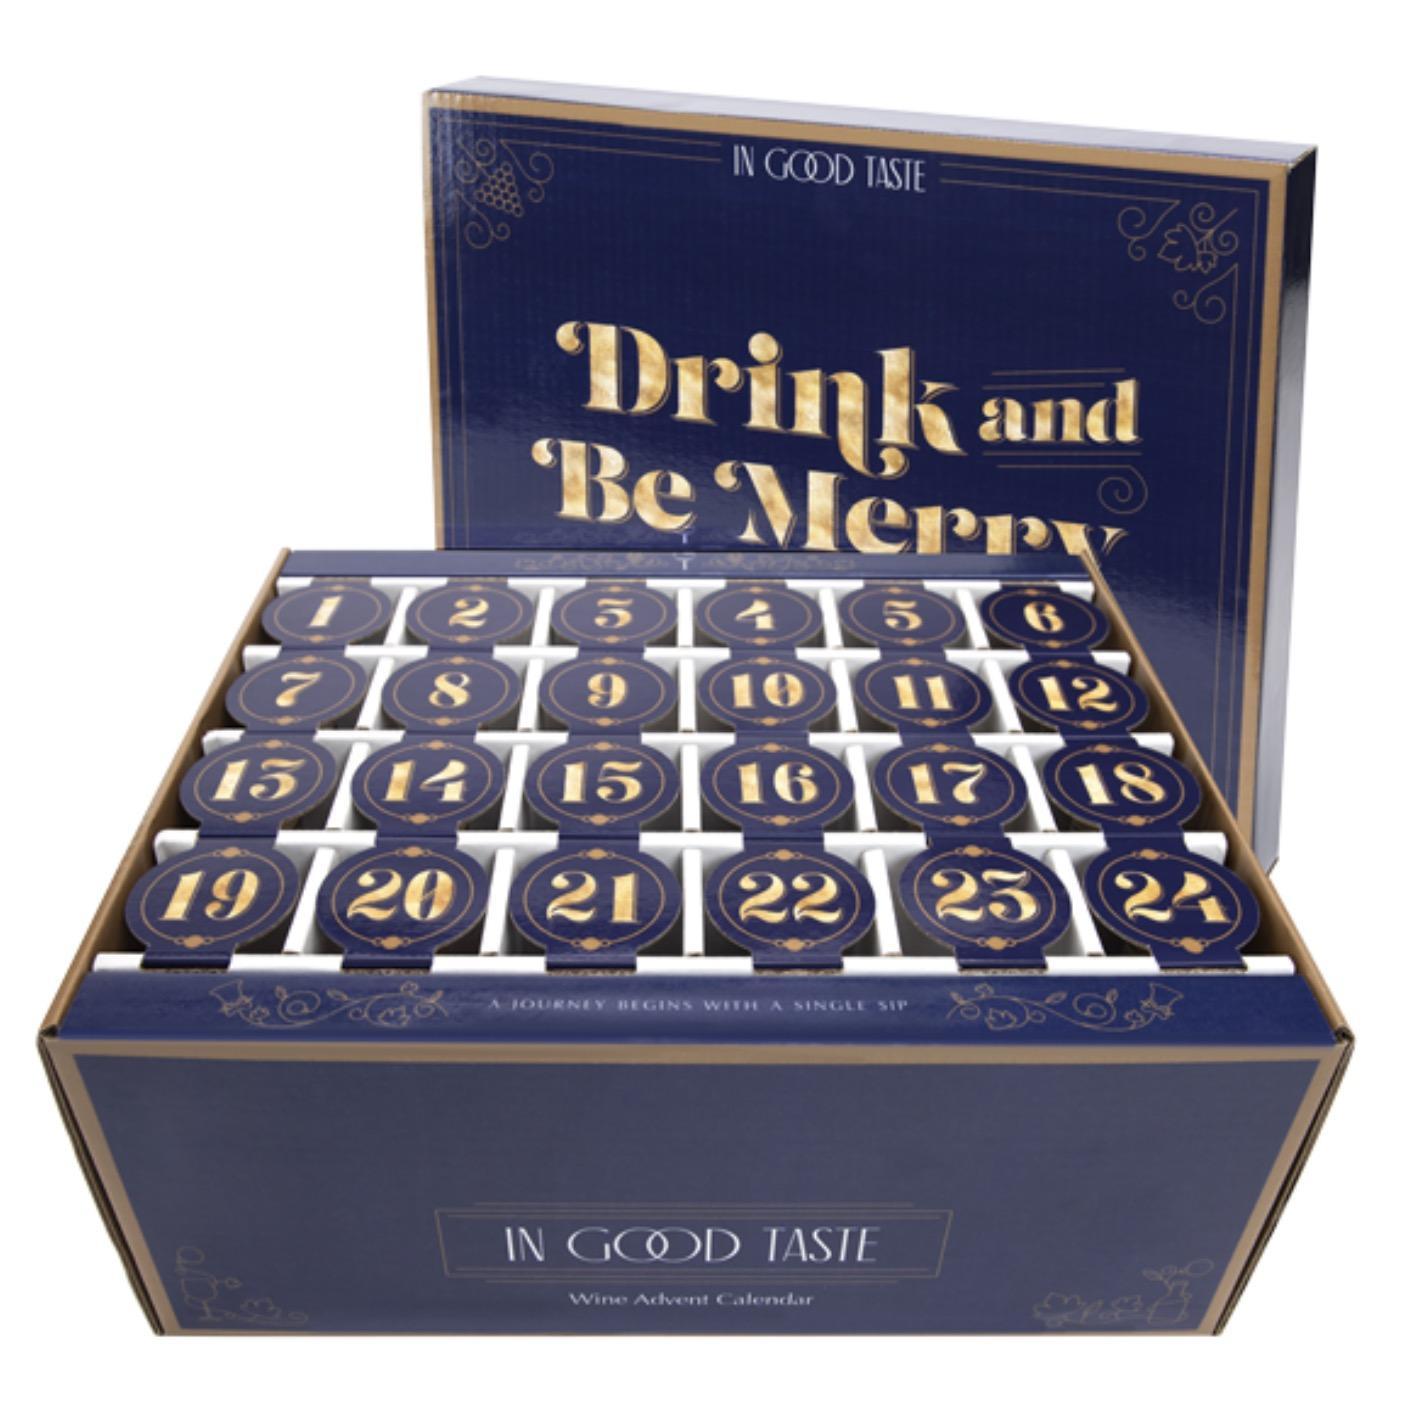 In Good Taste Drink & Be Merry Wine Advent Calendar – On Sale Now!